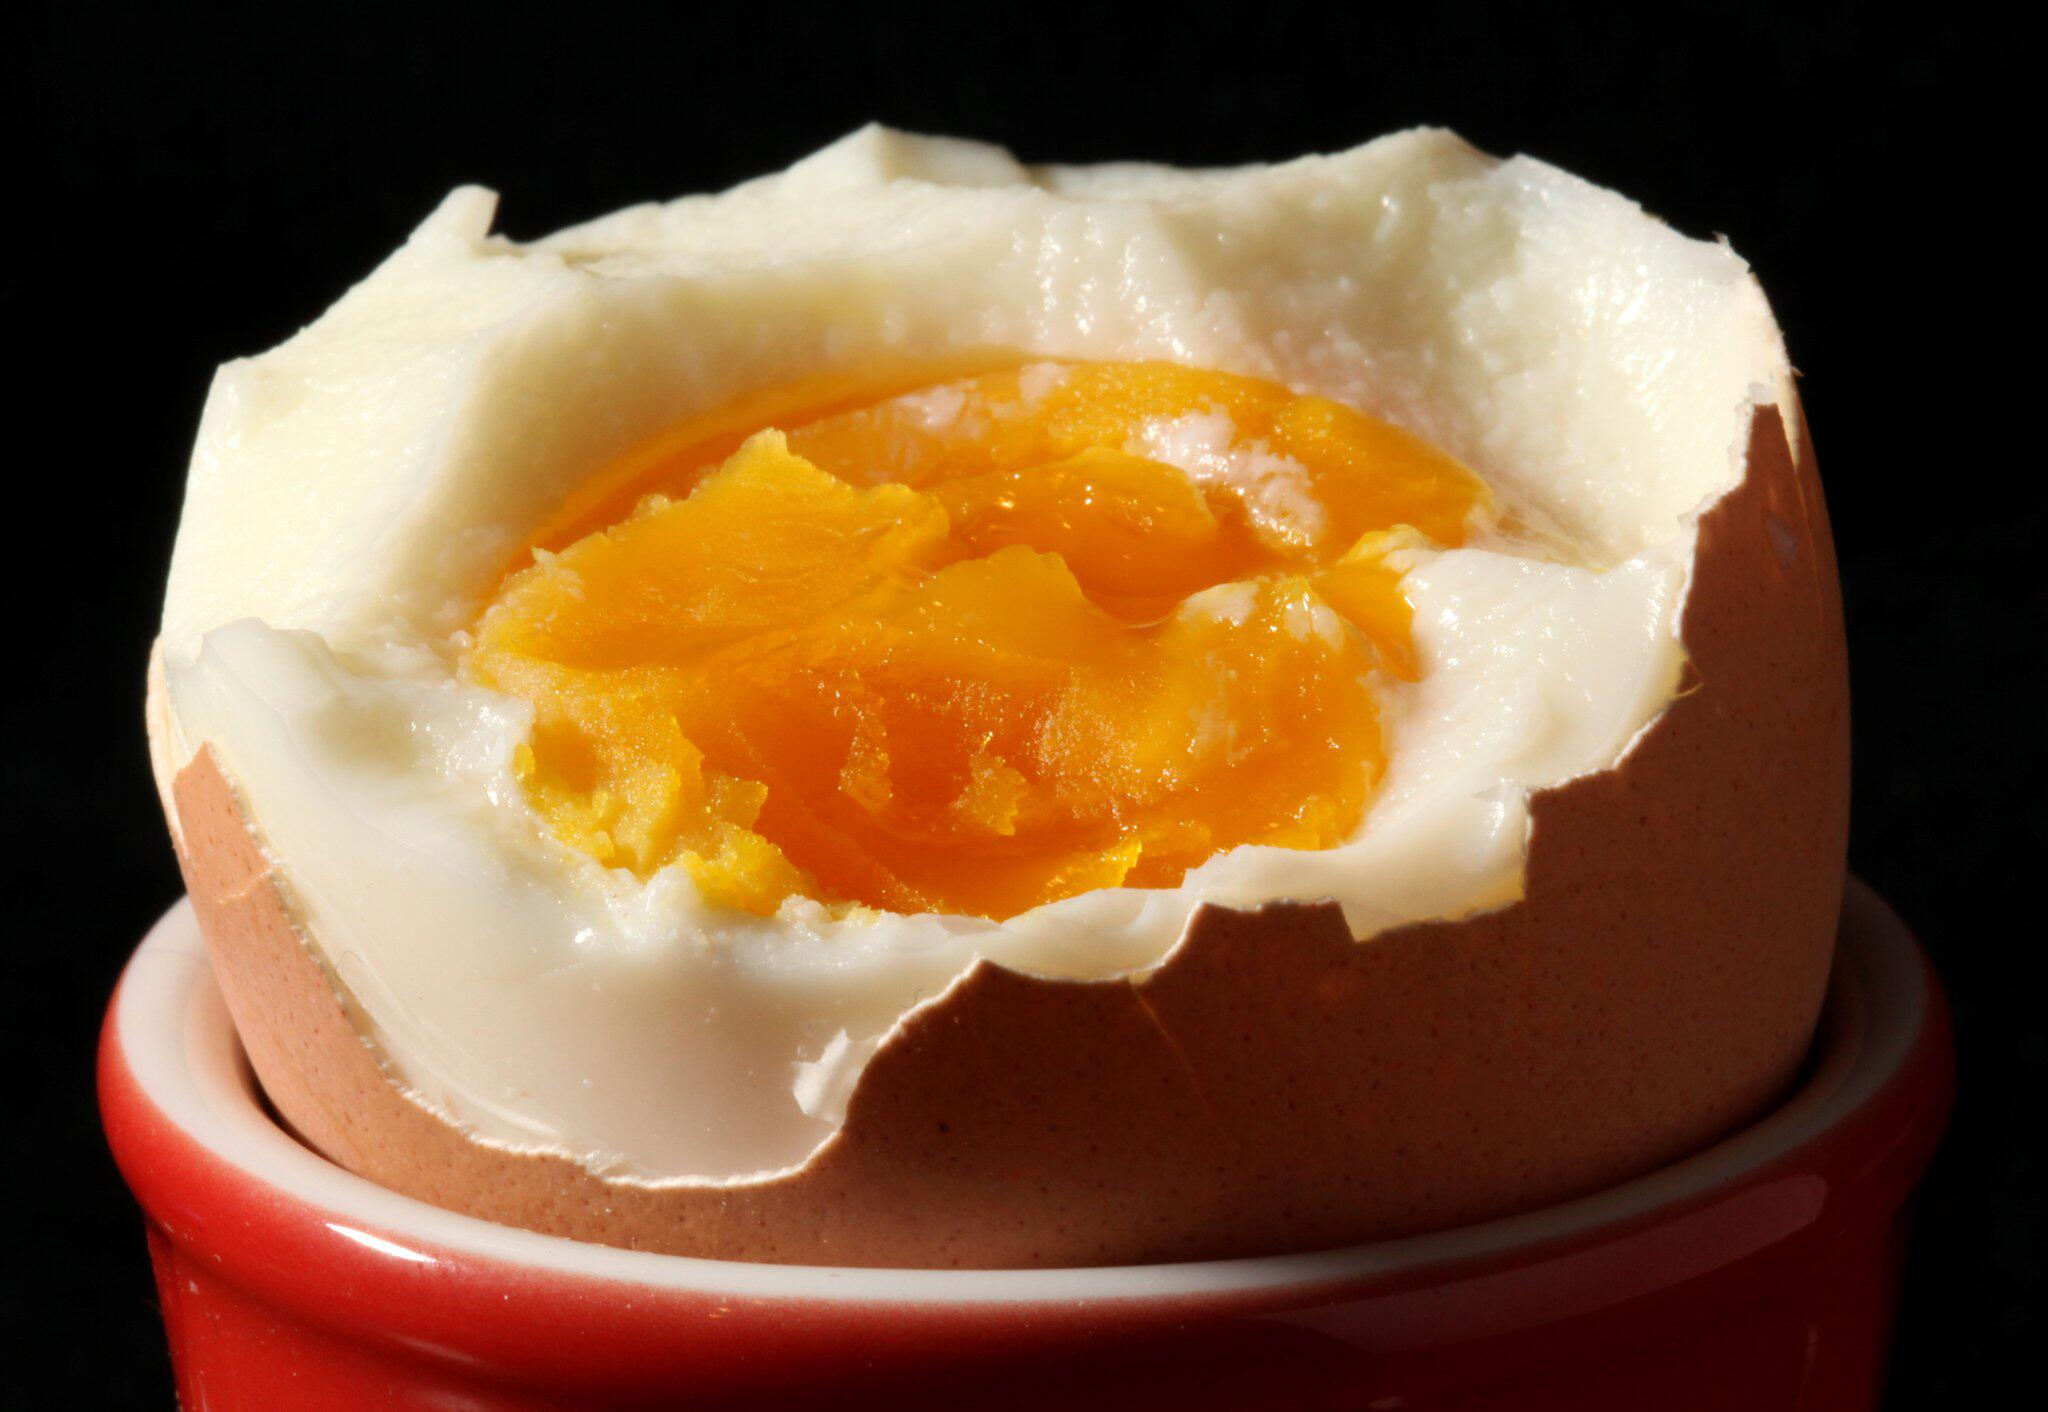 Bild zu Ei, Fupronil, Gift-Eier, Insektizid